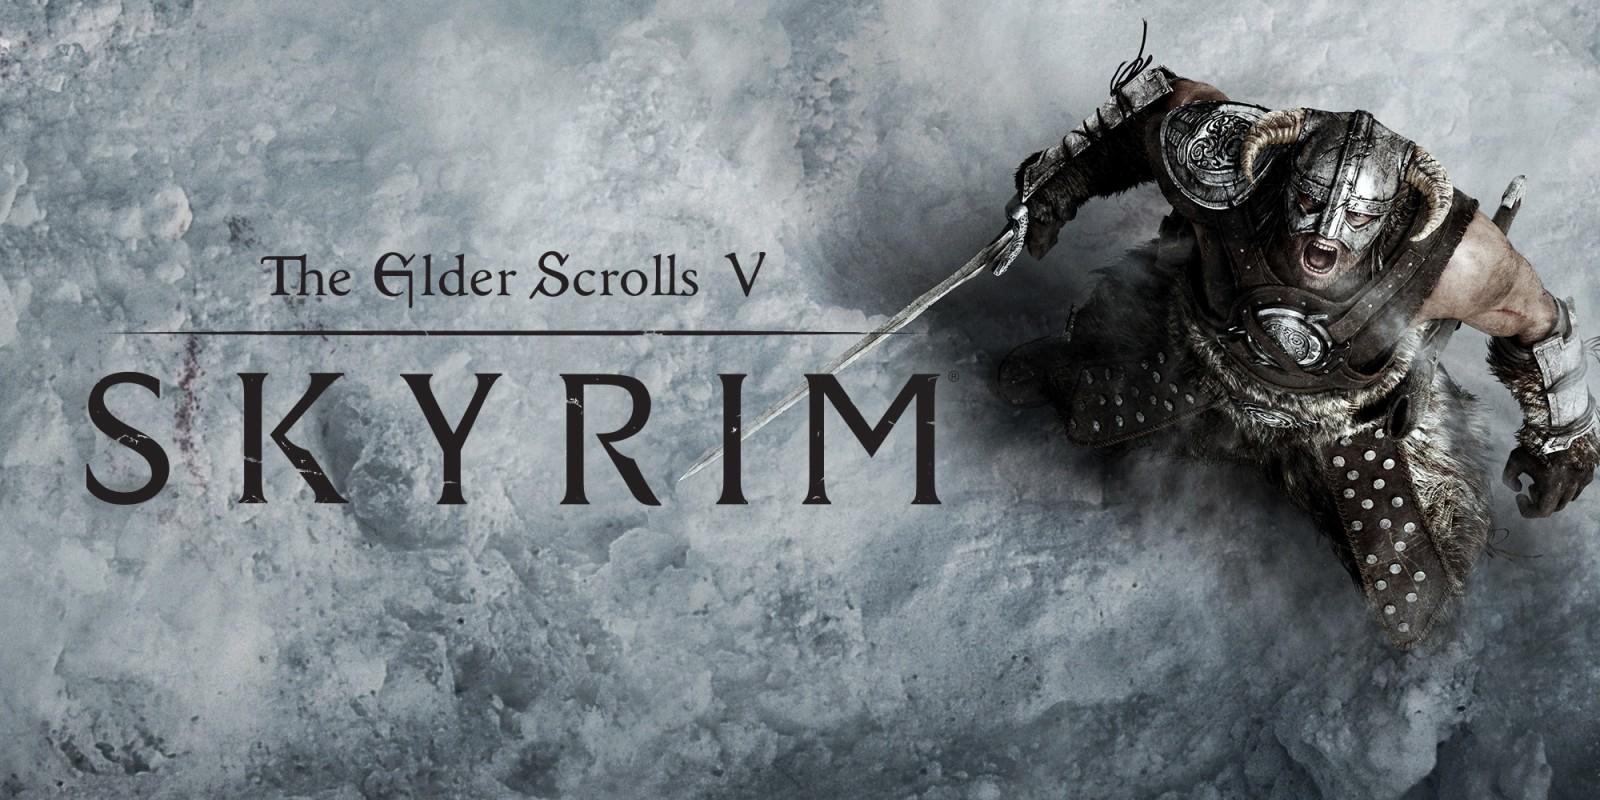 The Elder Scrolls V: Skyrim - Nintendo Switch Edition for